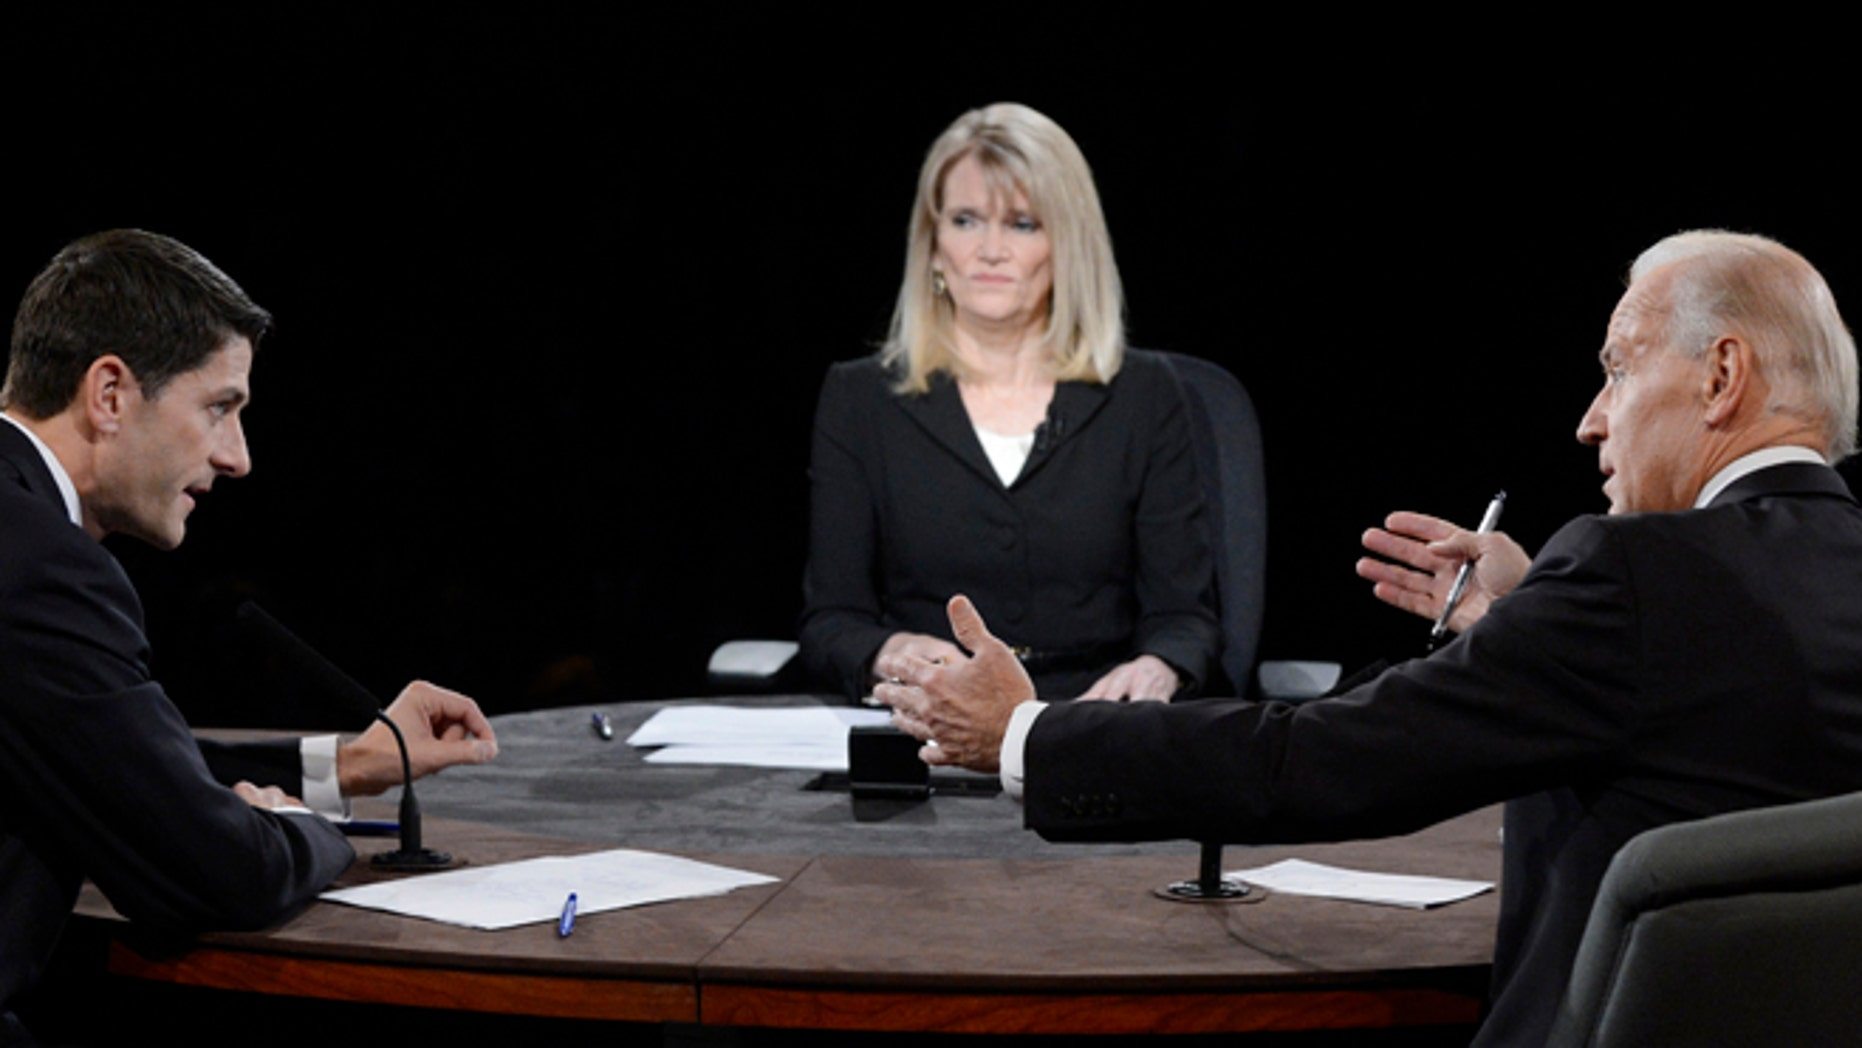 Oct. 11, 2012: Moderator Martha Raddatz watches as  Joe Biden and Paul Ryan participate in the vice presidential debate.